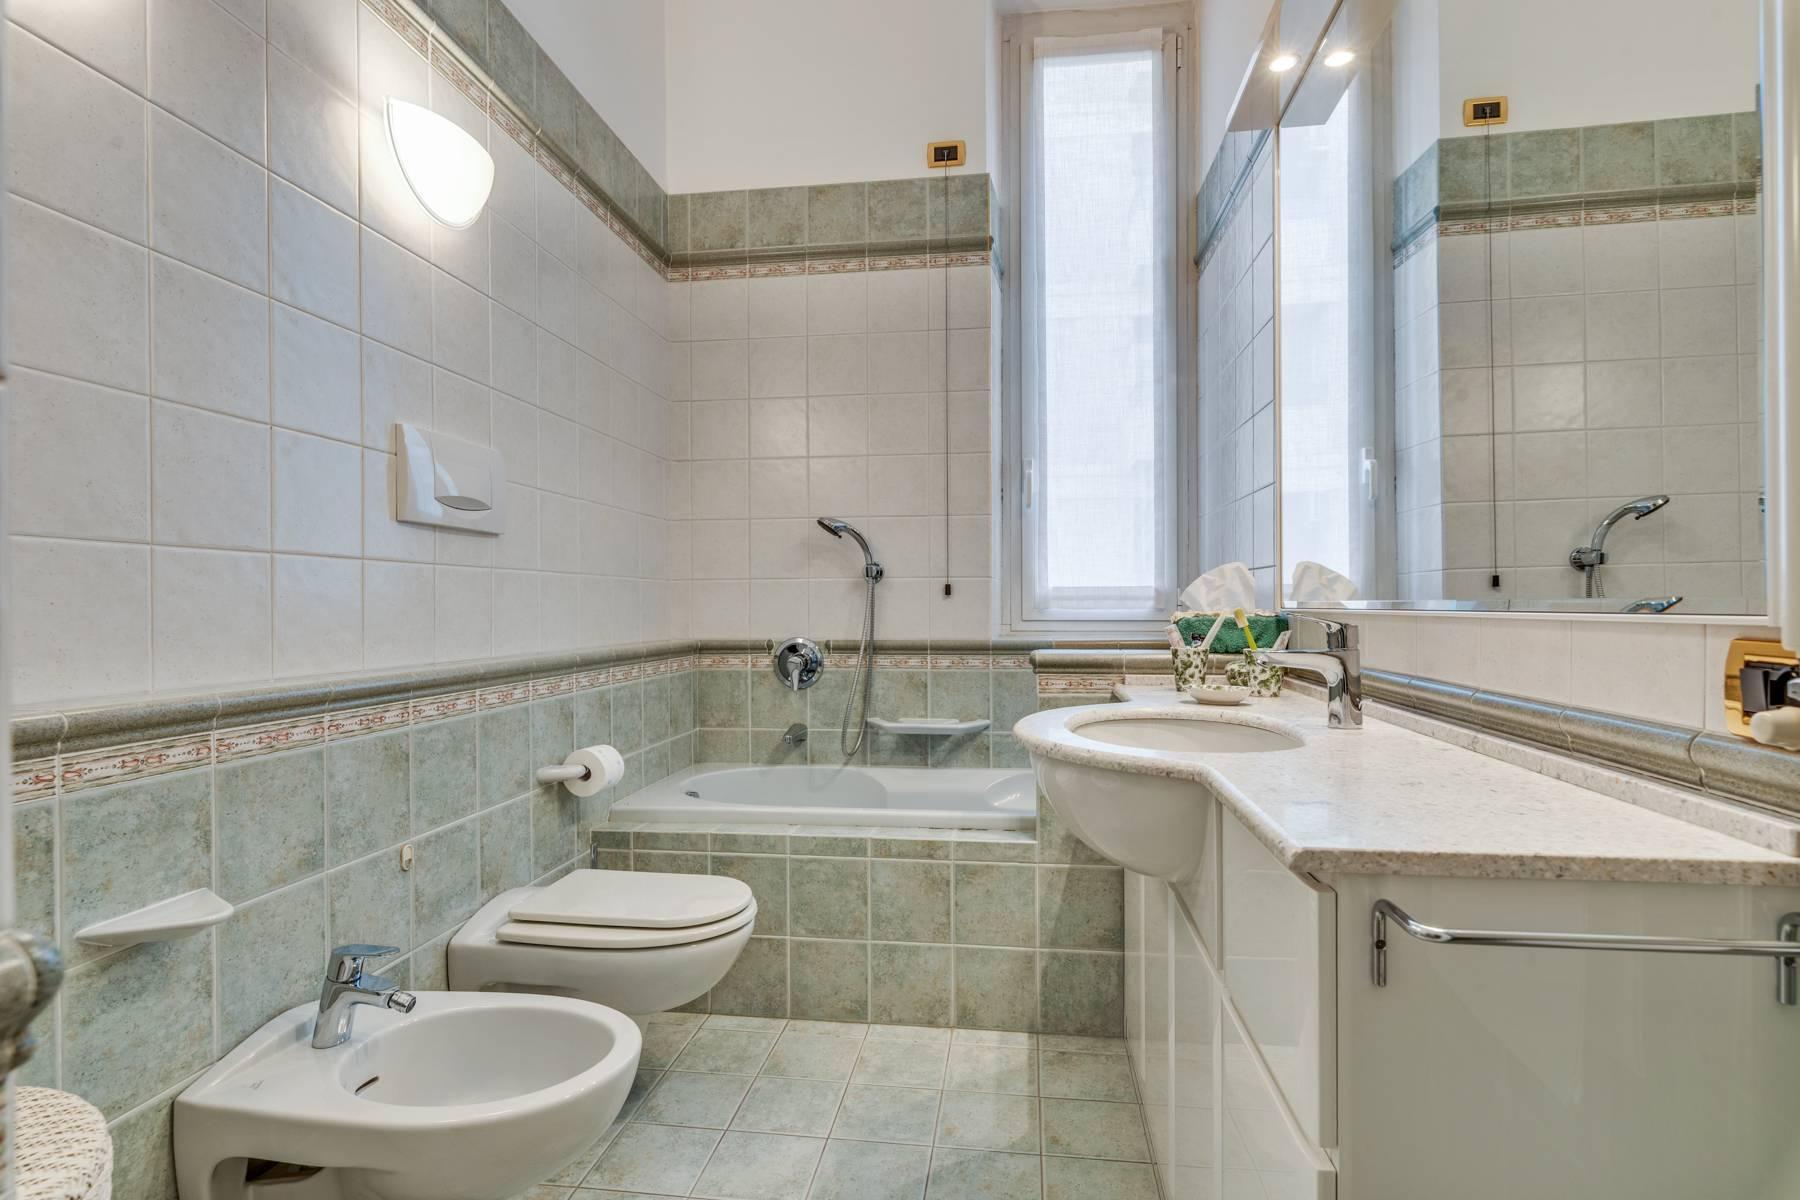 Prestigious 275 sqm apartment inside a period building in Carignano - 19